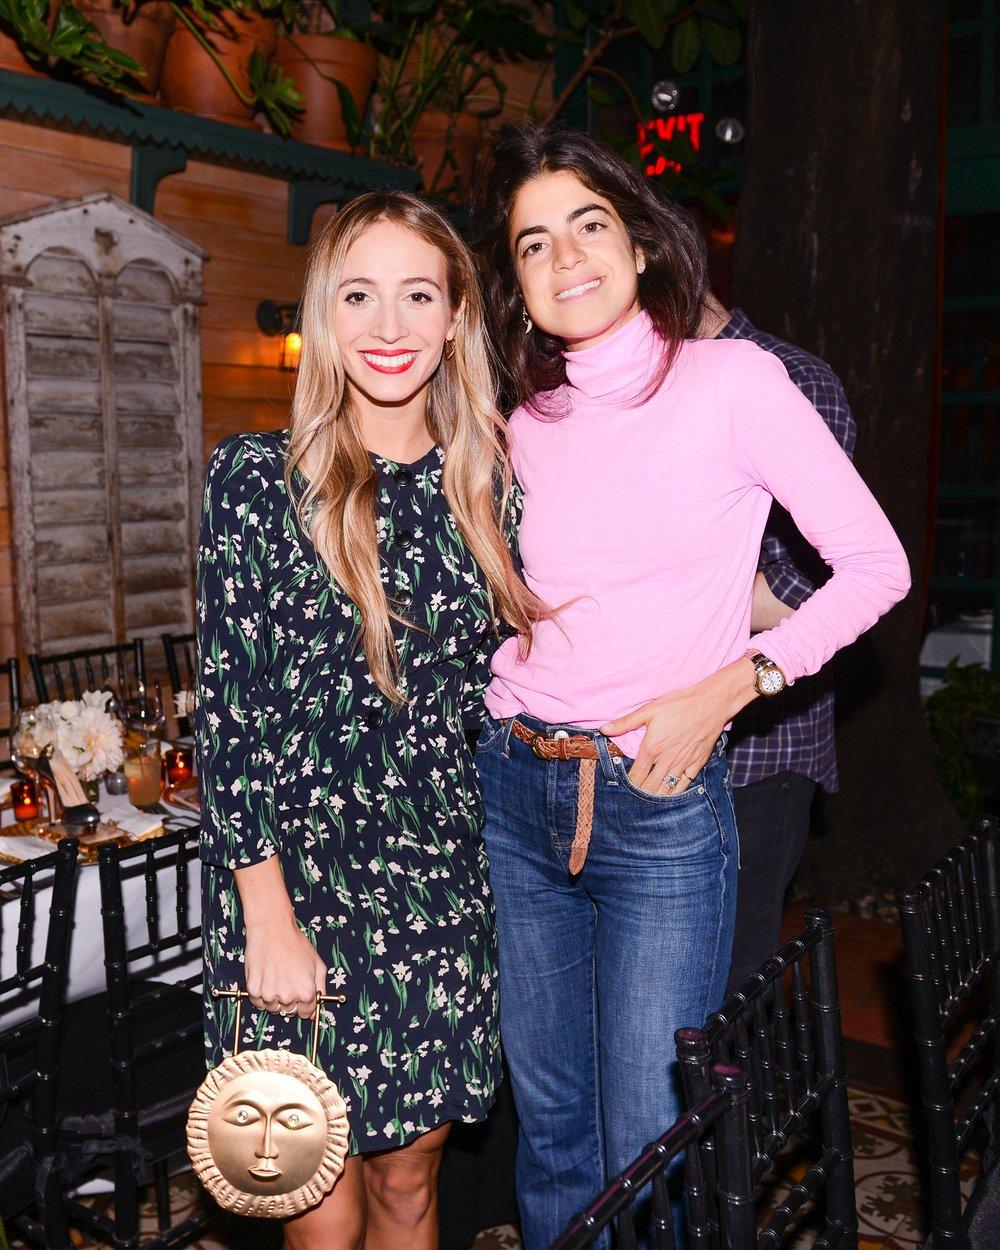 Harley Viera-Newton & Leandra Medine